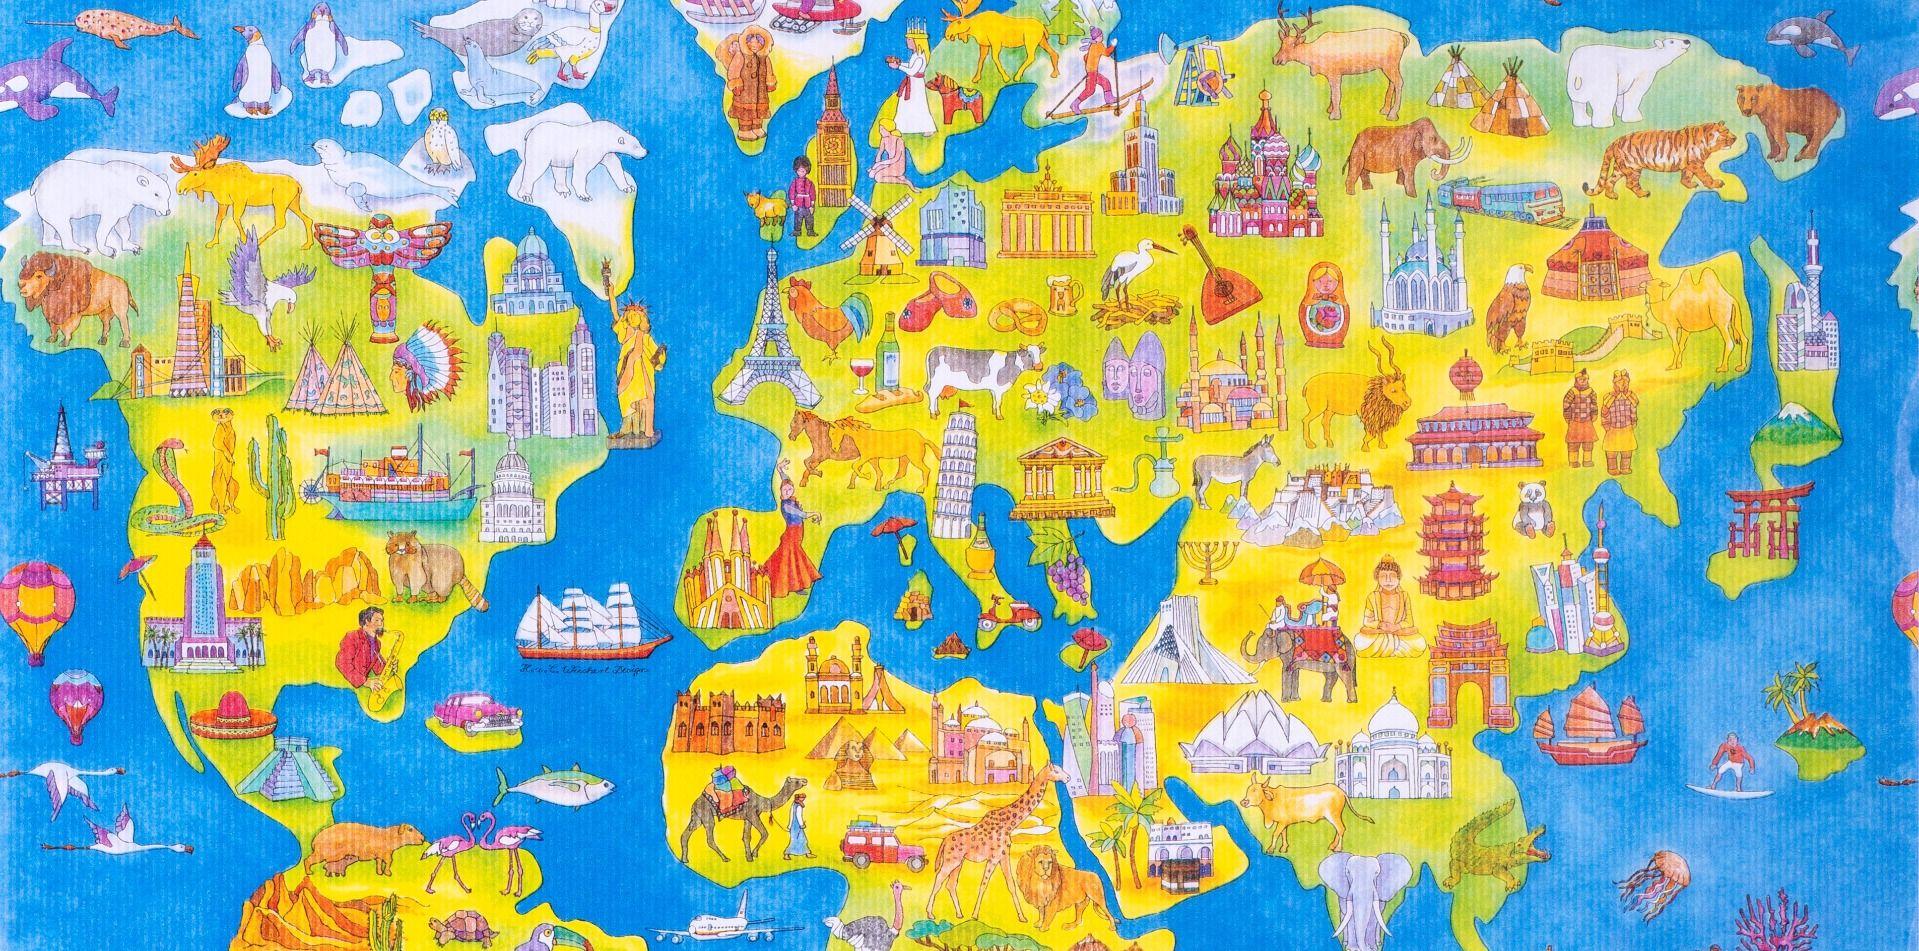 Geschenkpapier Weltkarte one World, Geschenkpapier Ausschnitt